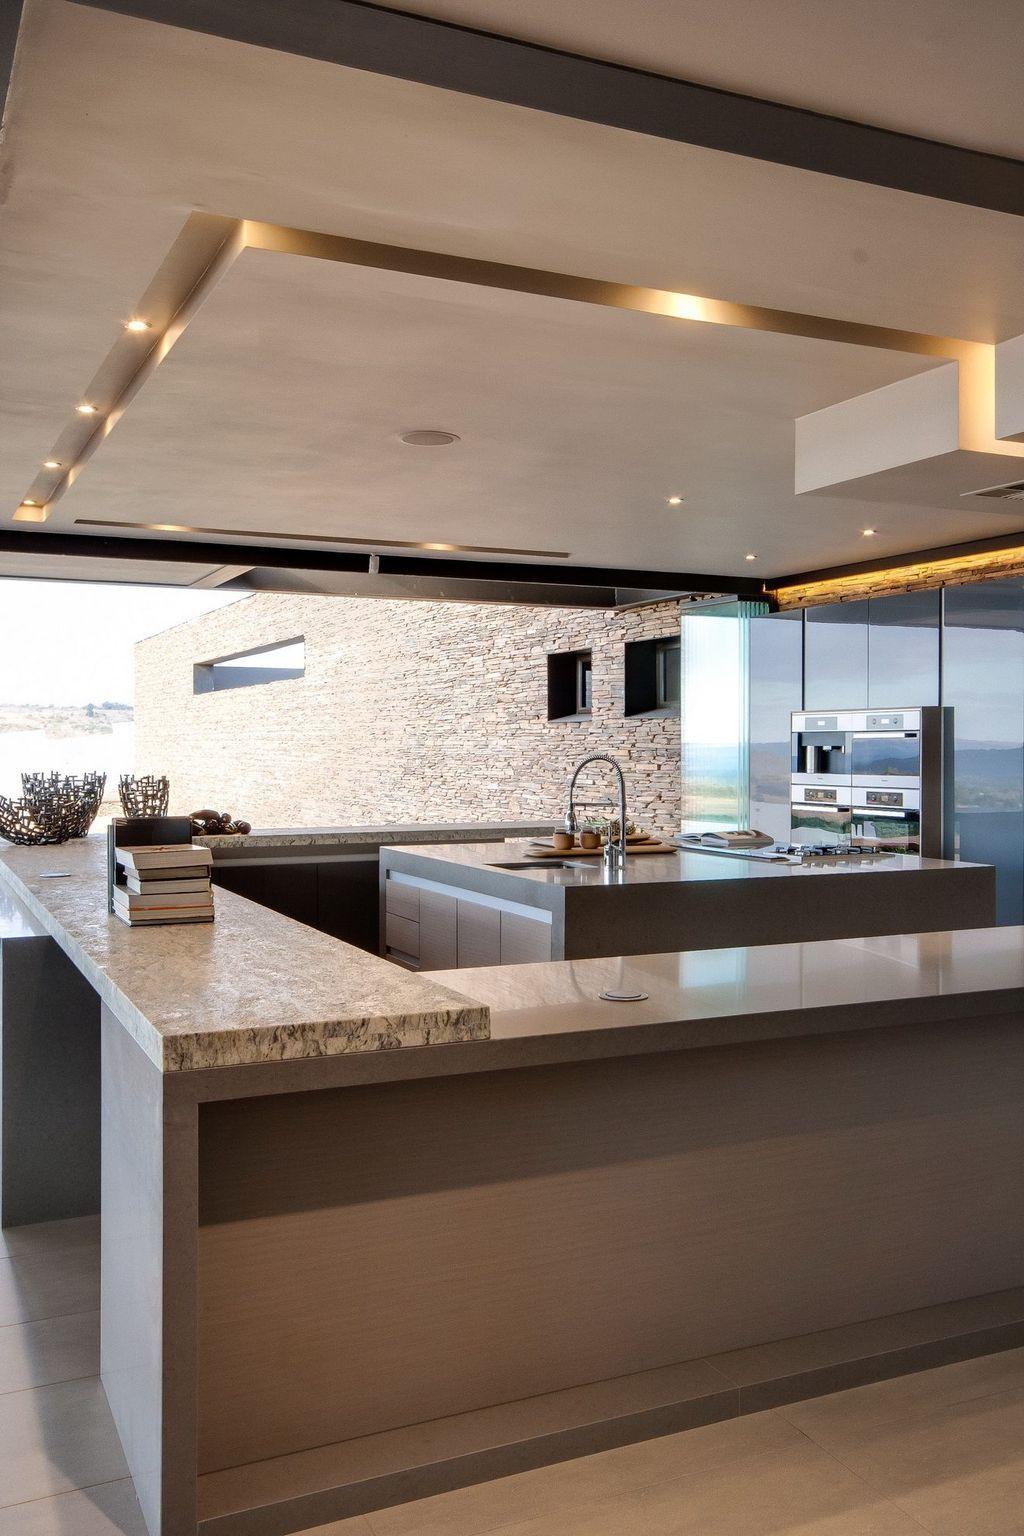 42 Fantastic Kitchen Ceiling Design Ideas Decoomo Com Kitchen